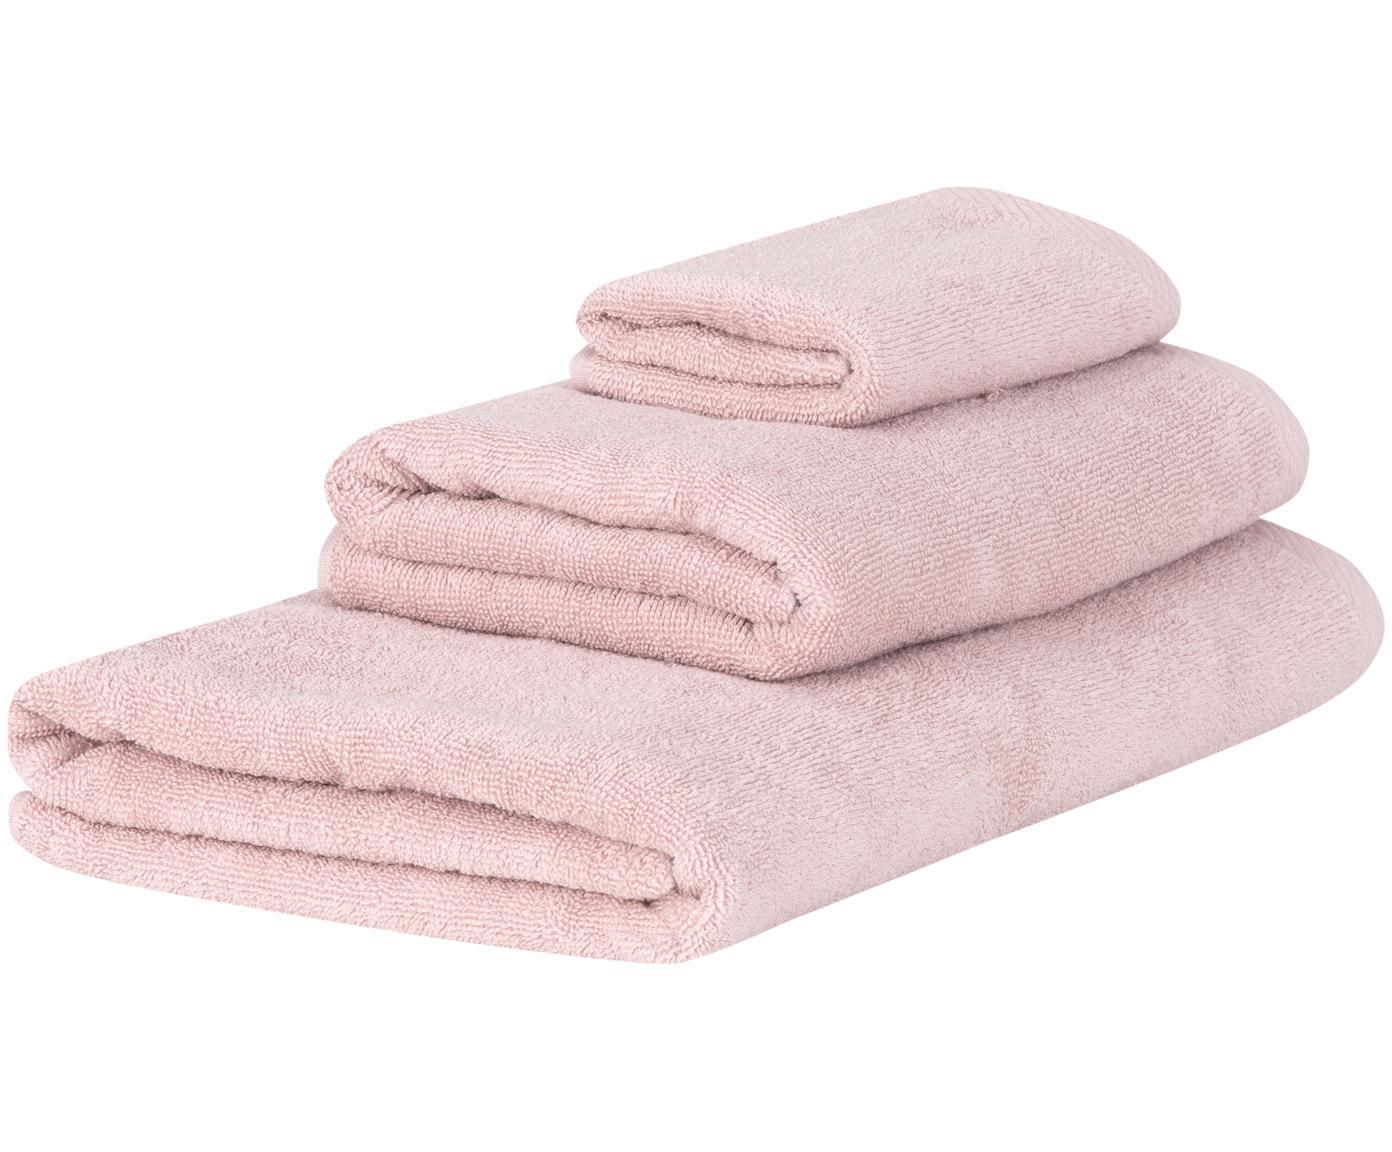 Set de toallas Comfort, 3pzas., Rosa palo, Tamaños diferentes